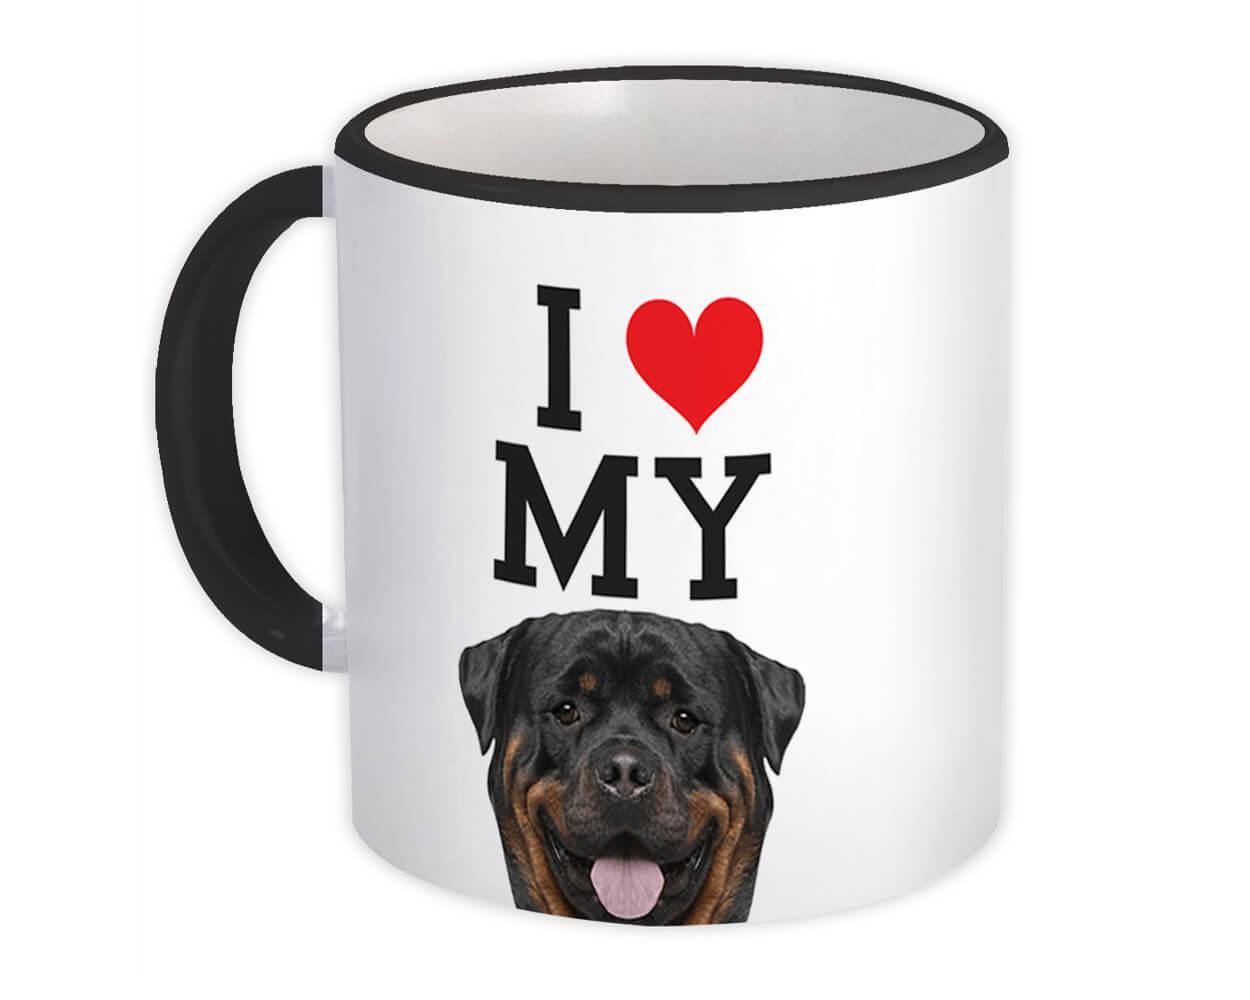 I Love My Rottweiler : Gift Mug Dog Lover Funny Owner Cute Animal Pet